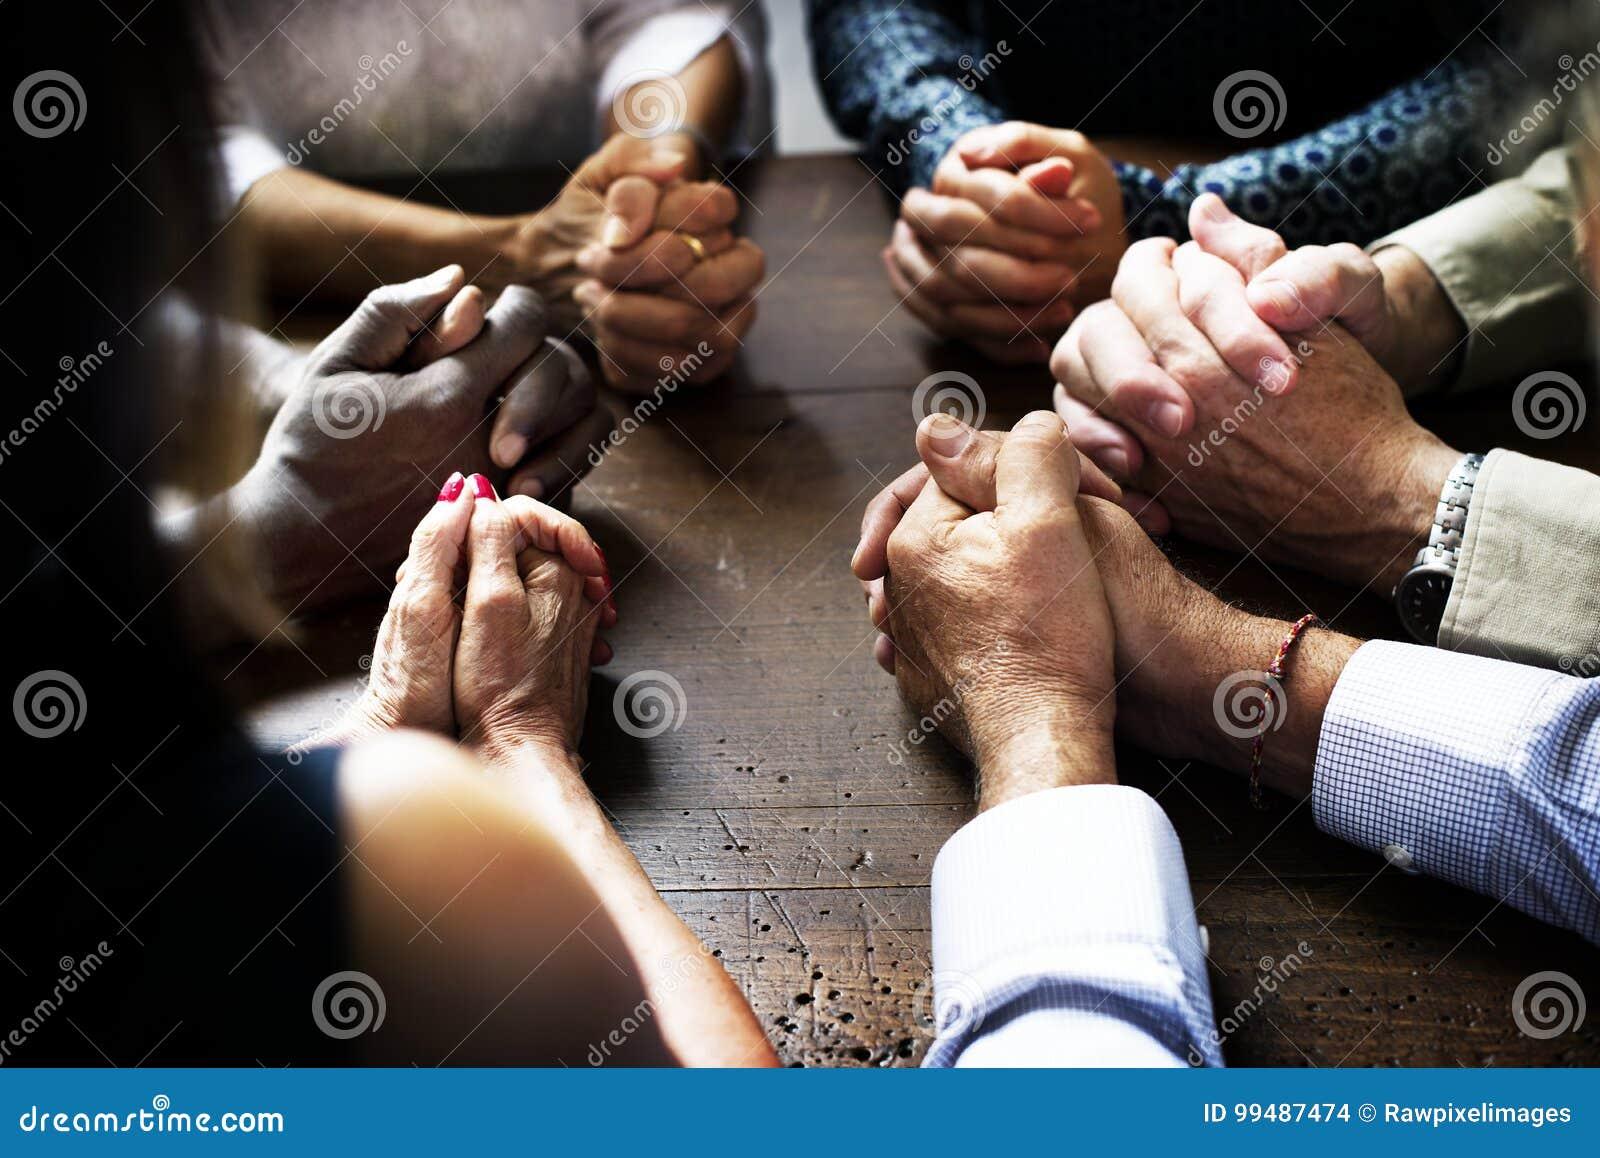 Gruppen av kristet folk ber tillsammans